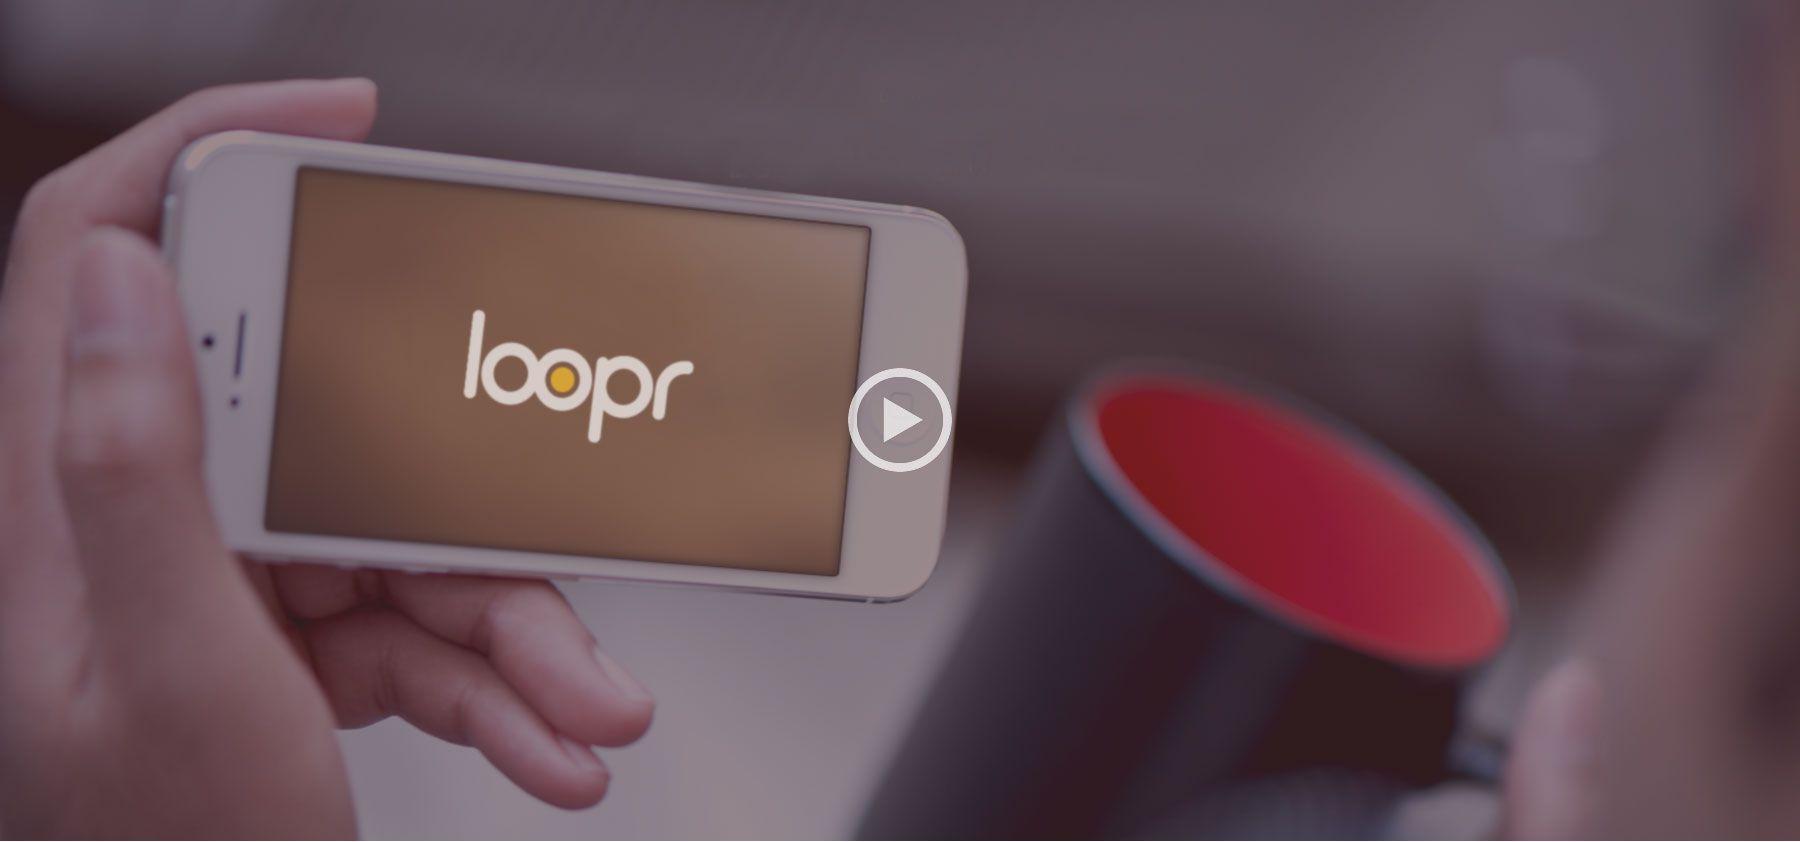 loopr - Your City. Full Circle. Denver's Cannabis Social Lounge